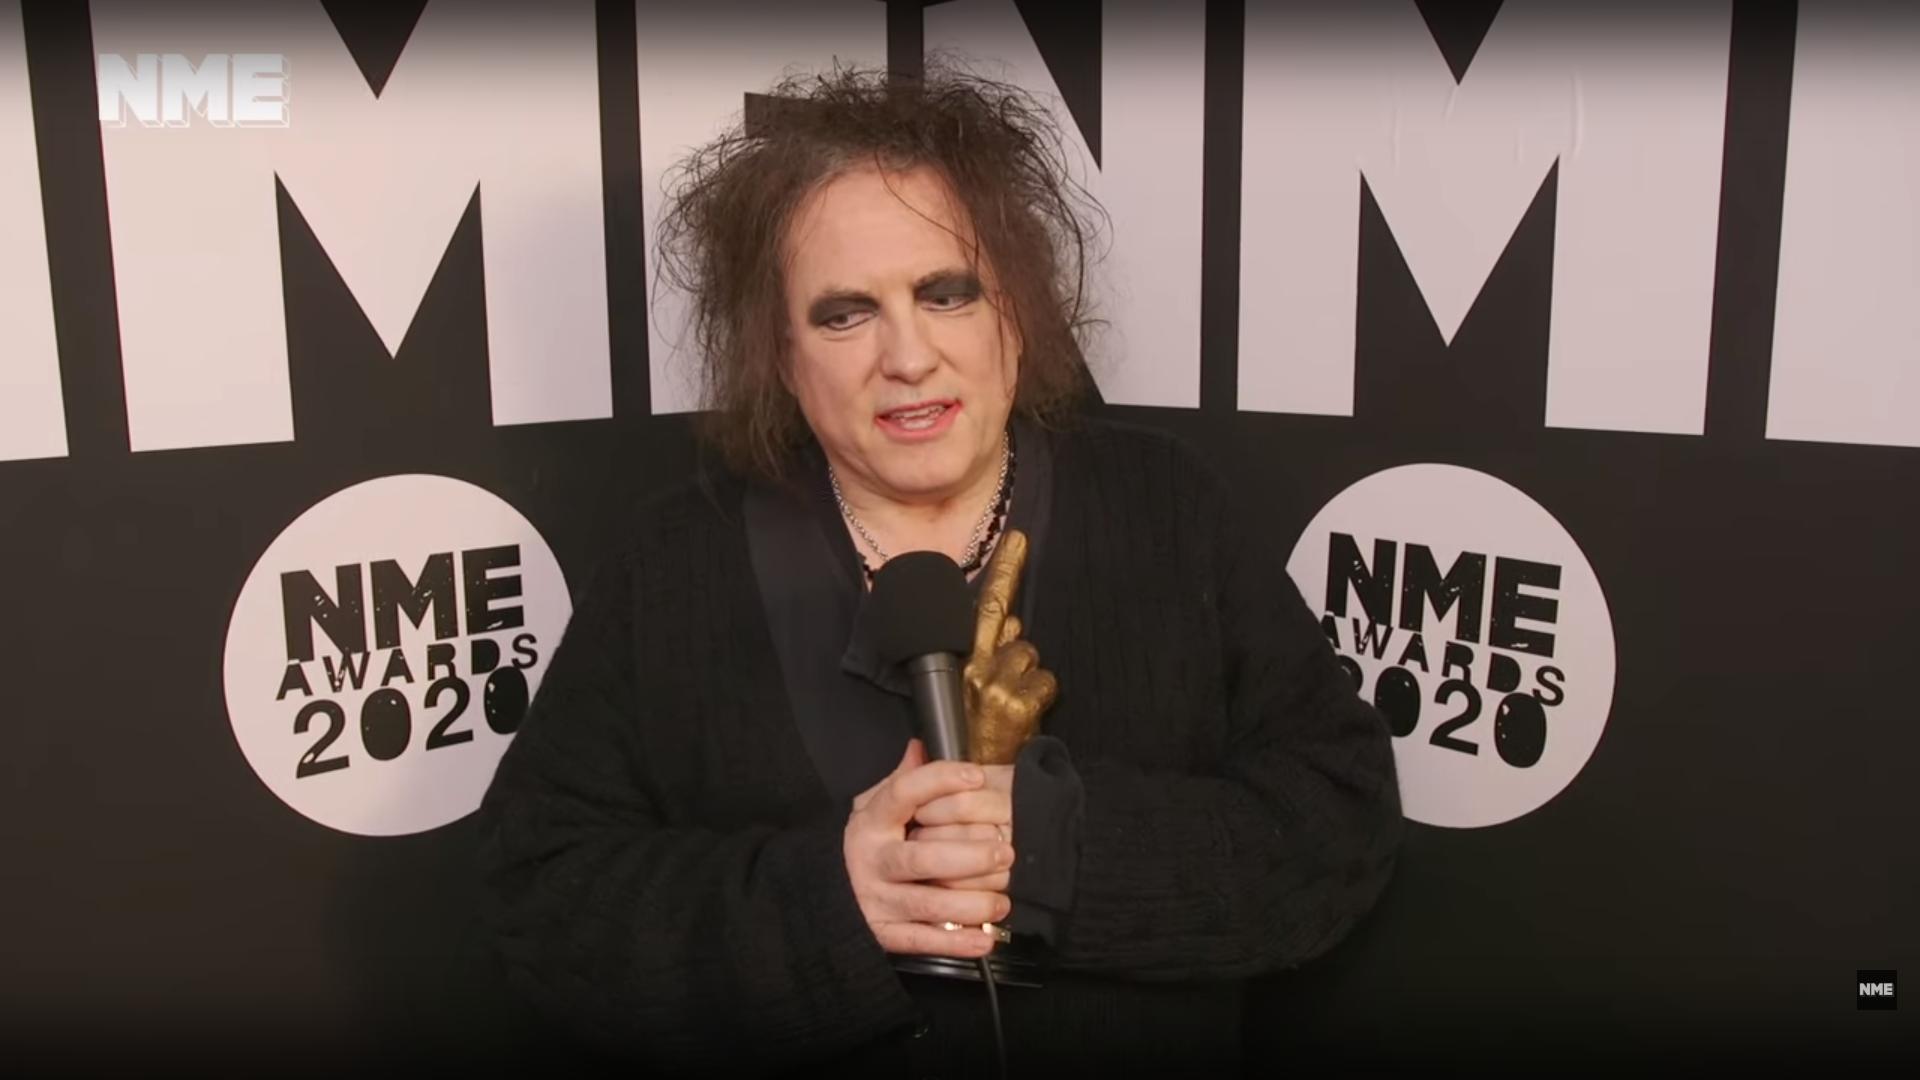 Resultado de imagen de robert smith nme awards 2020